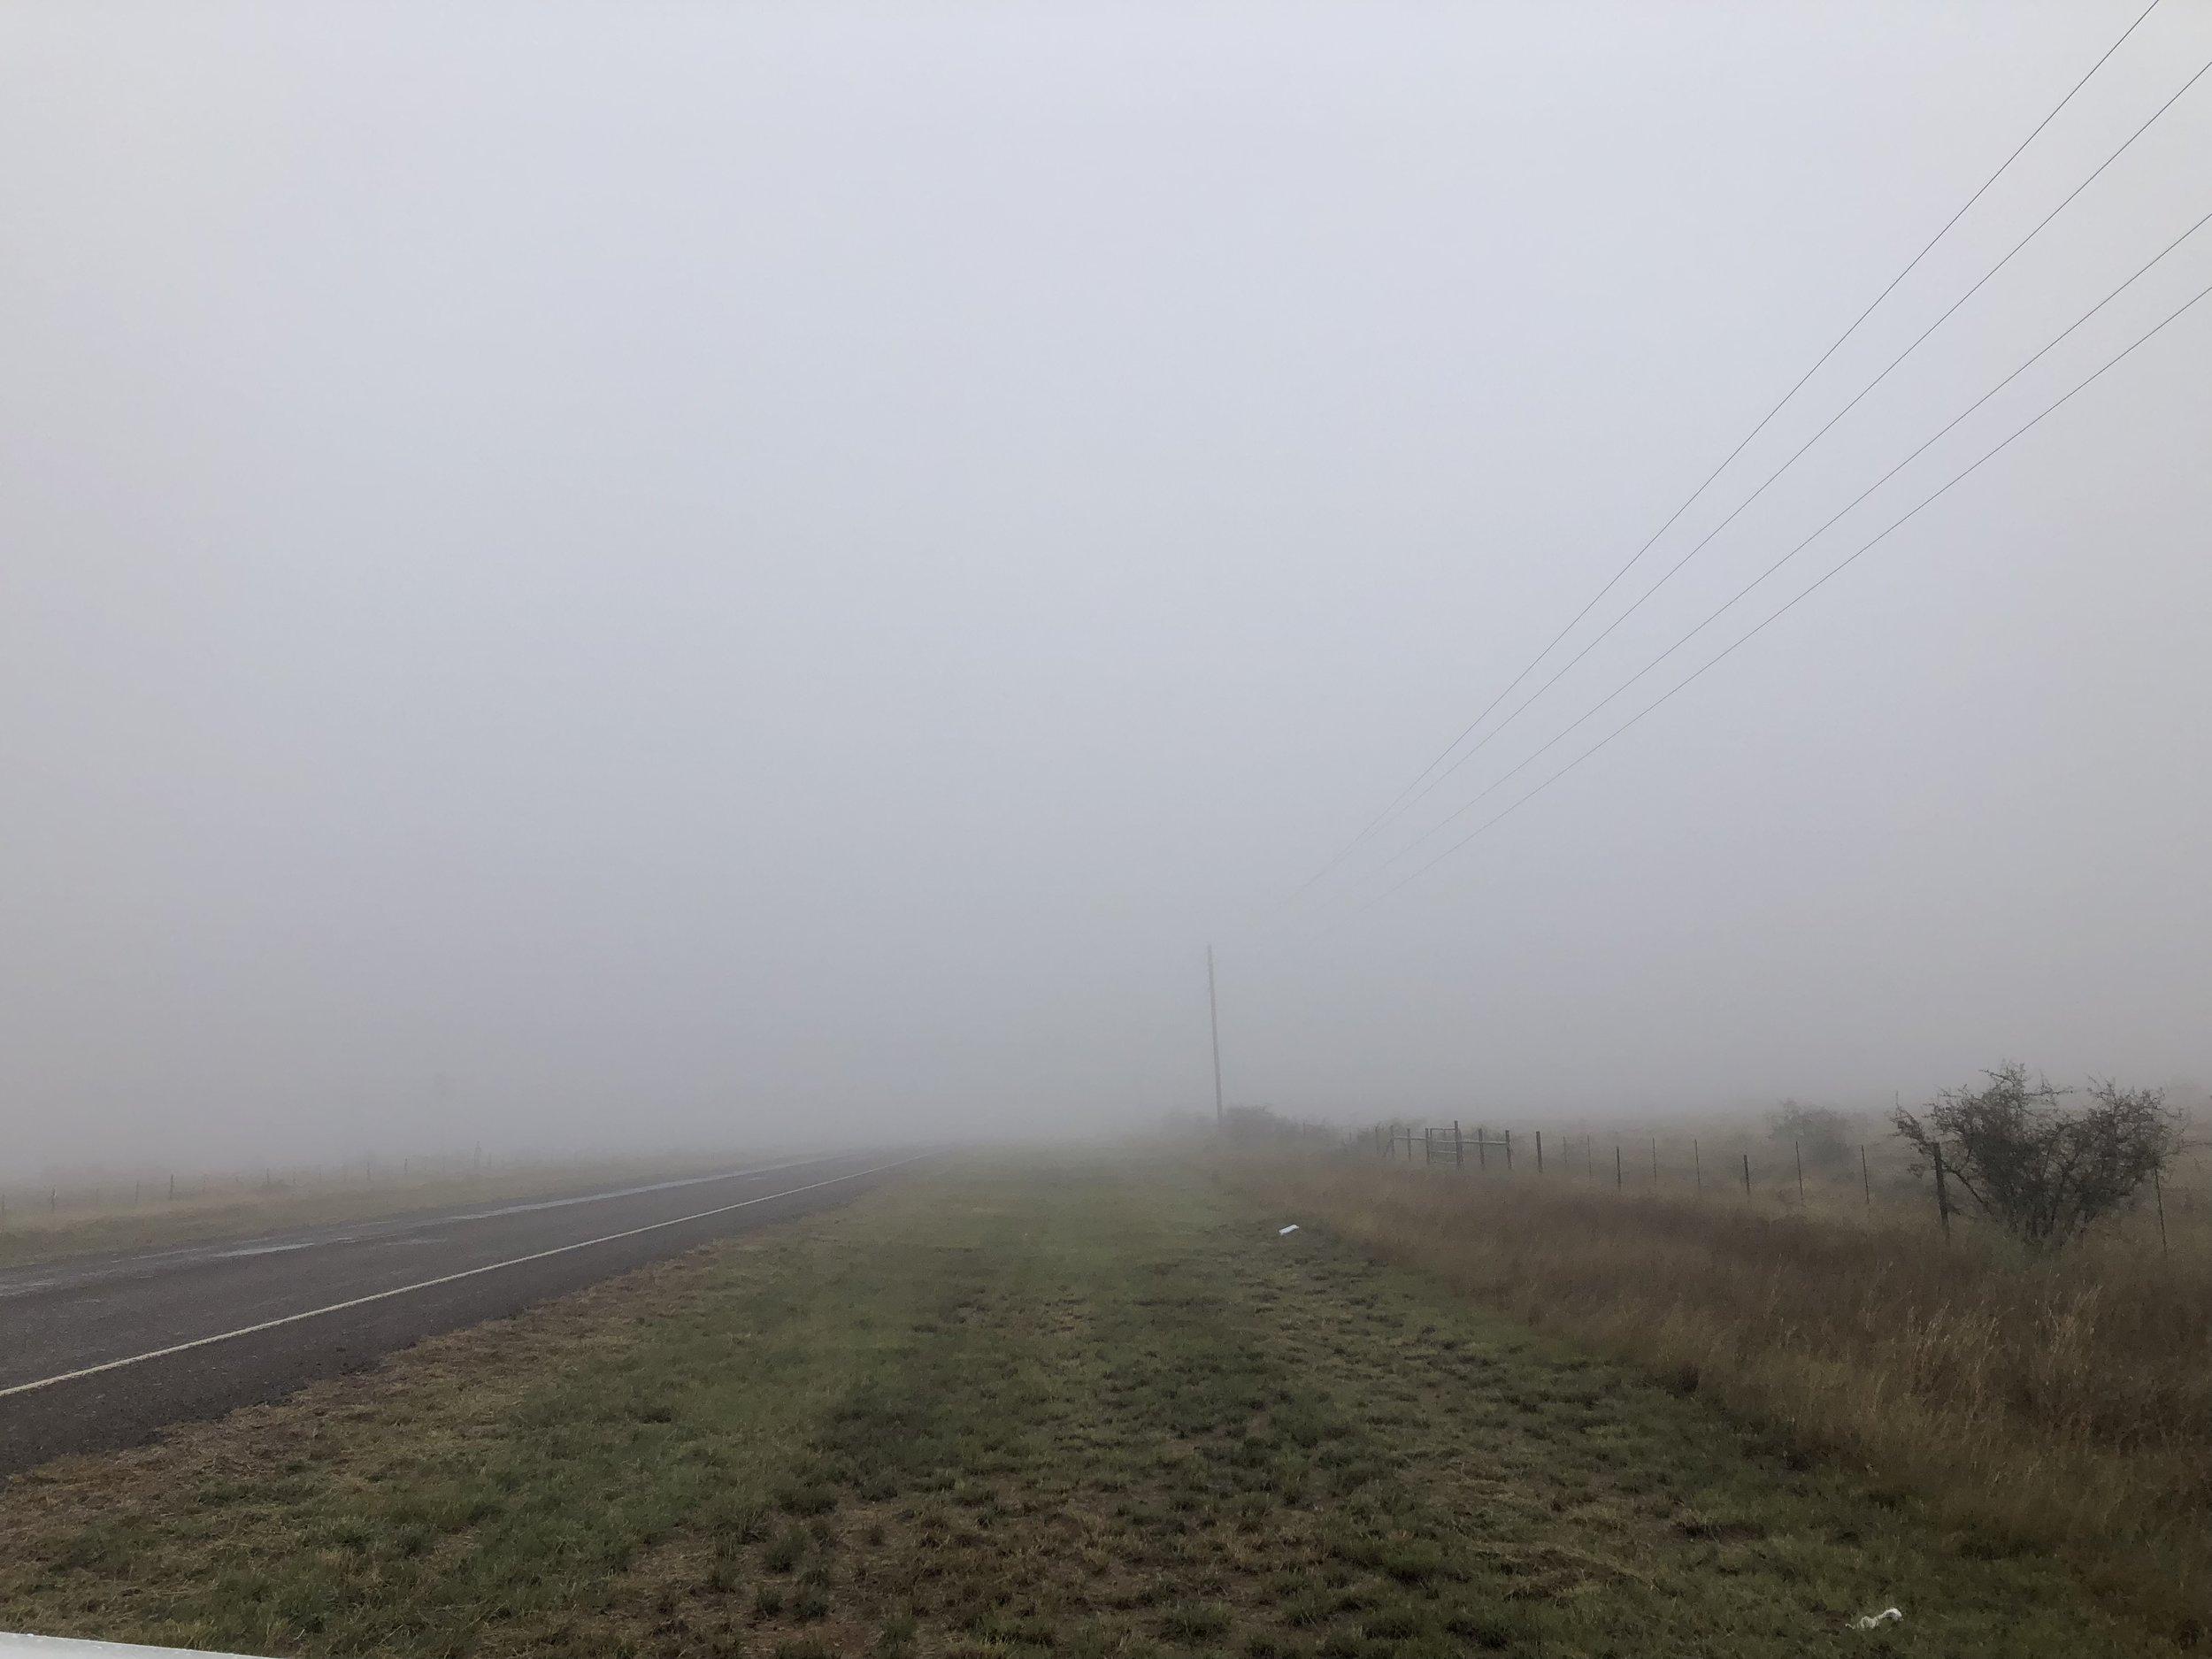 It was super foggy.